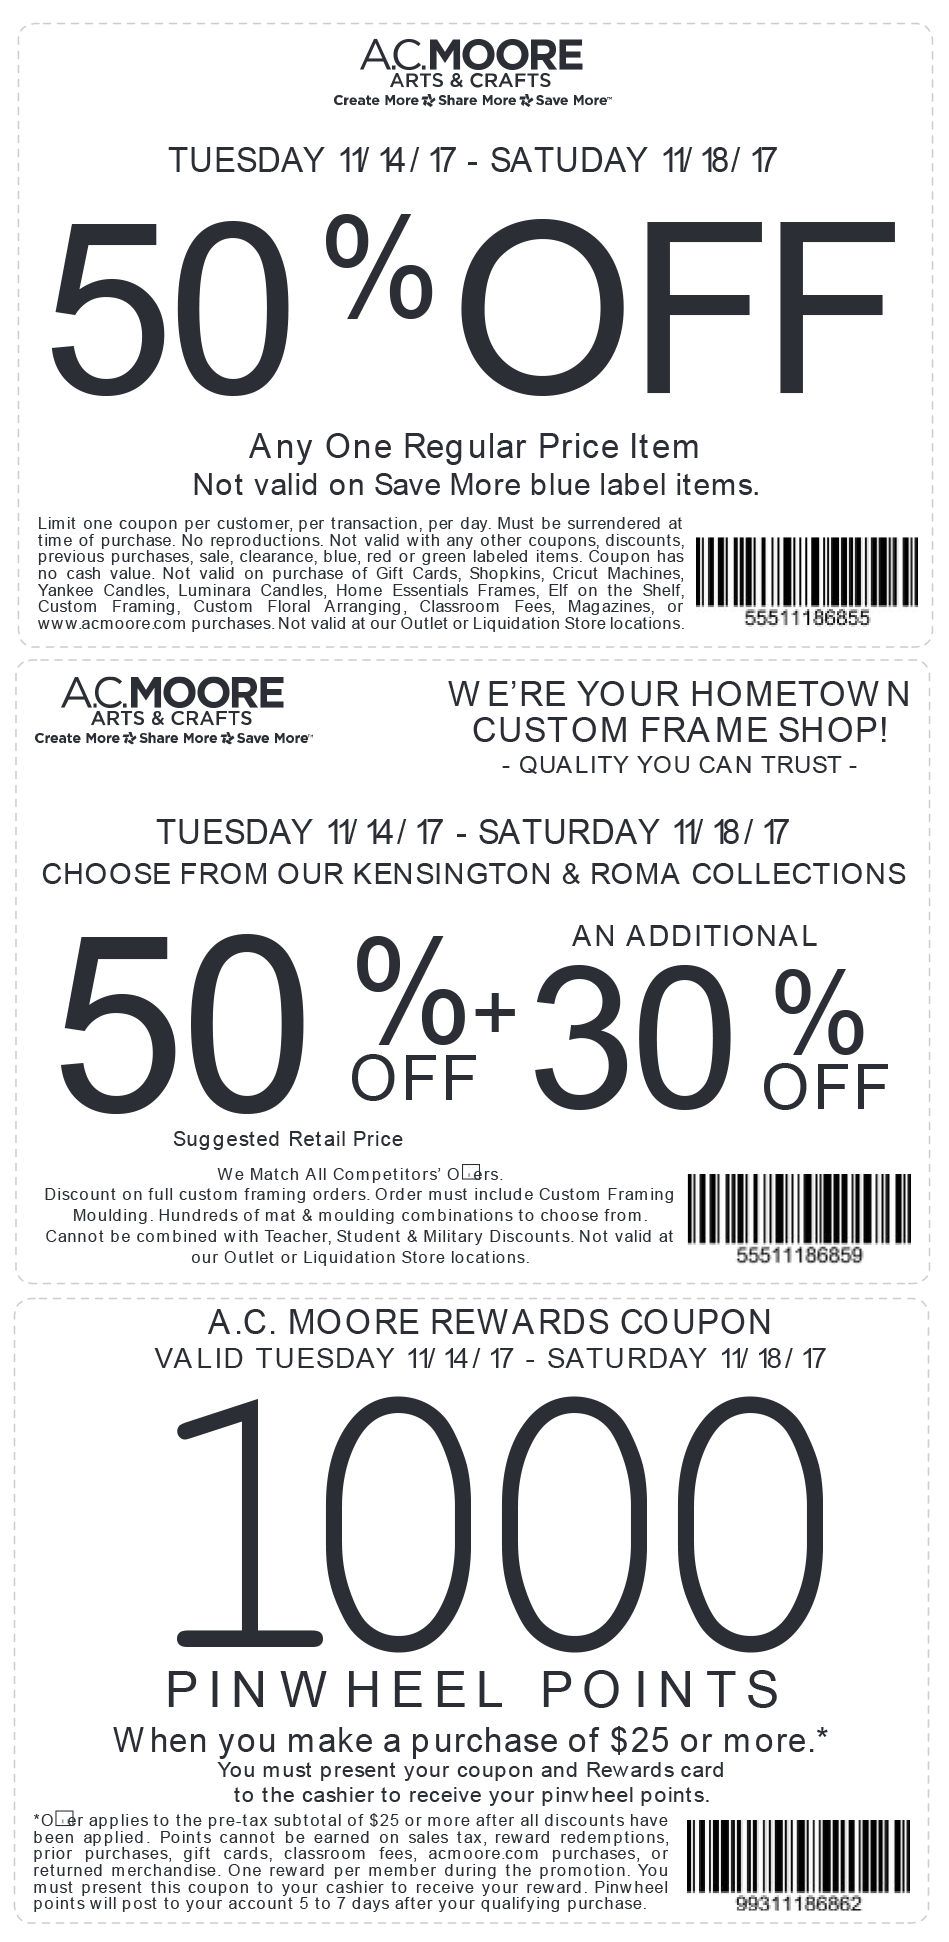 A.C.Moore.com Promo Coupon 50% off a single item at A.C. Moore